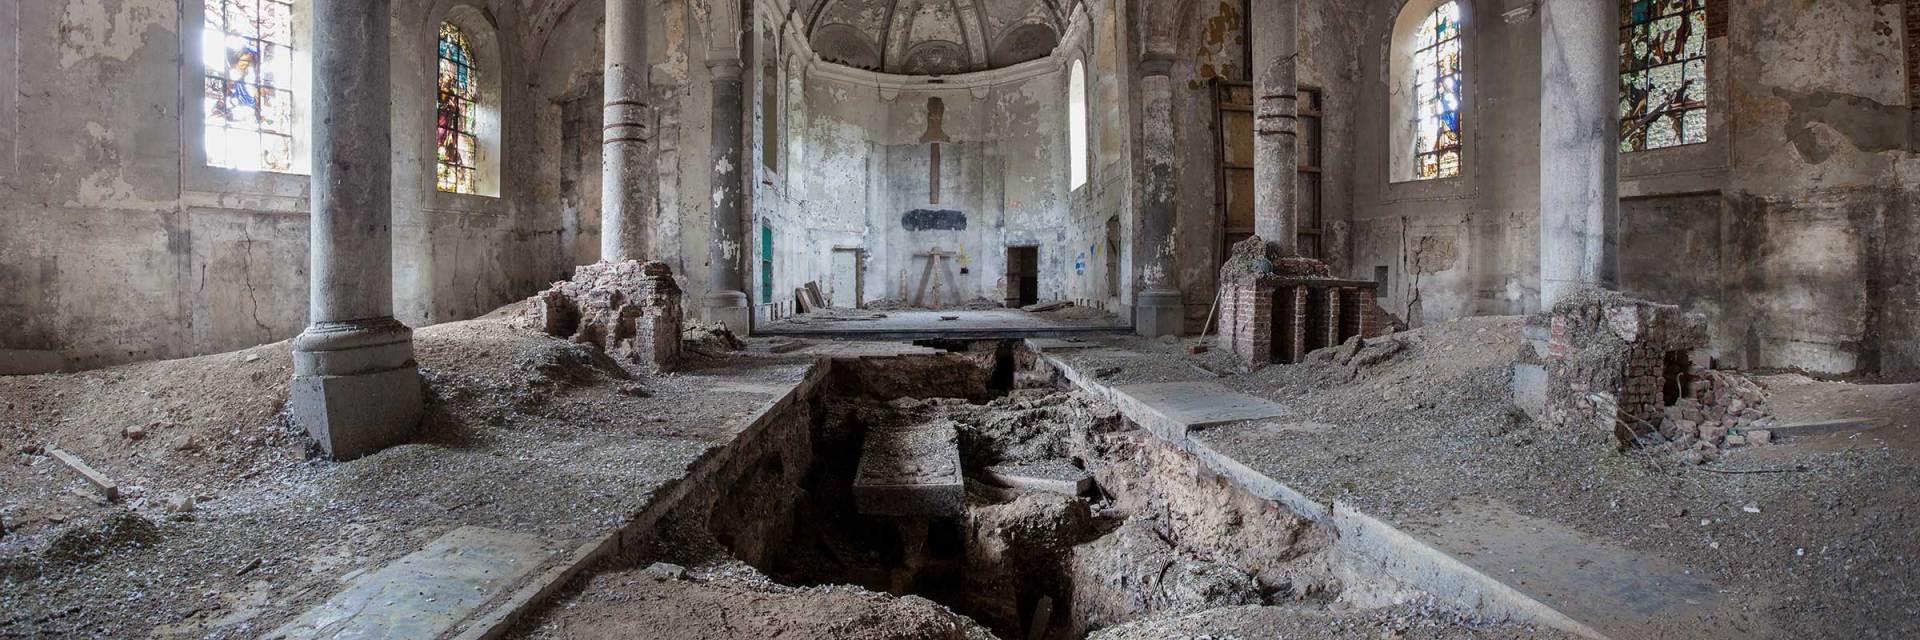 gravestone church, urbex, verlaten kerk